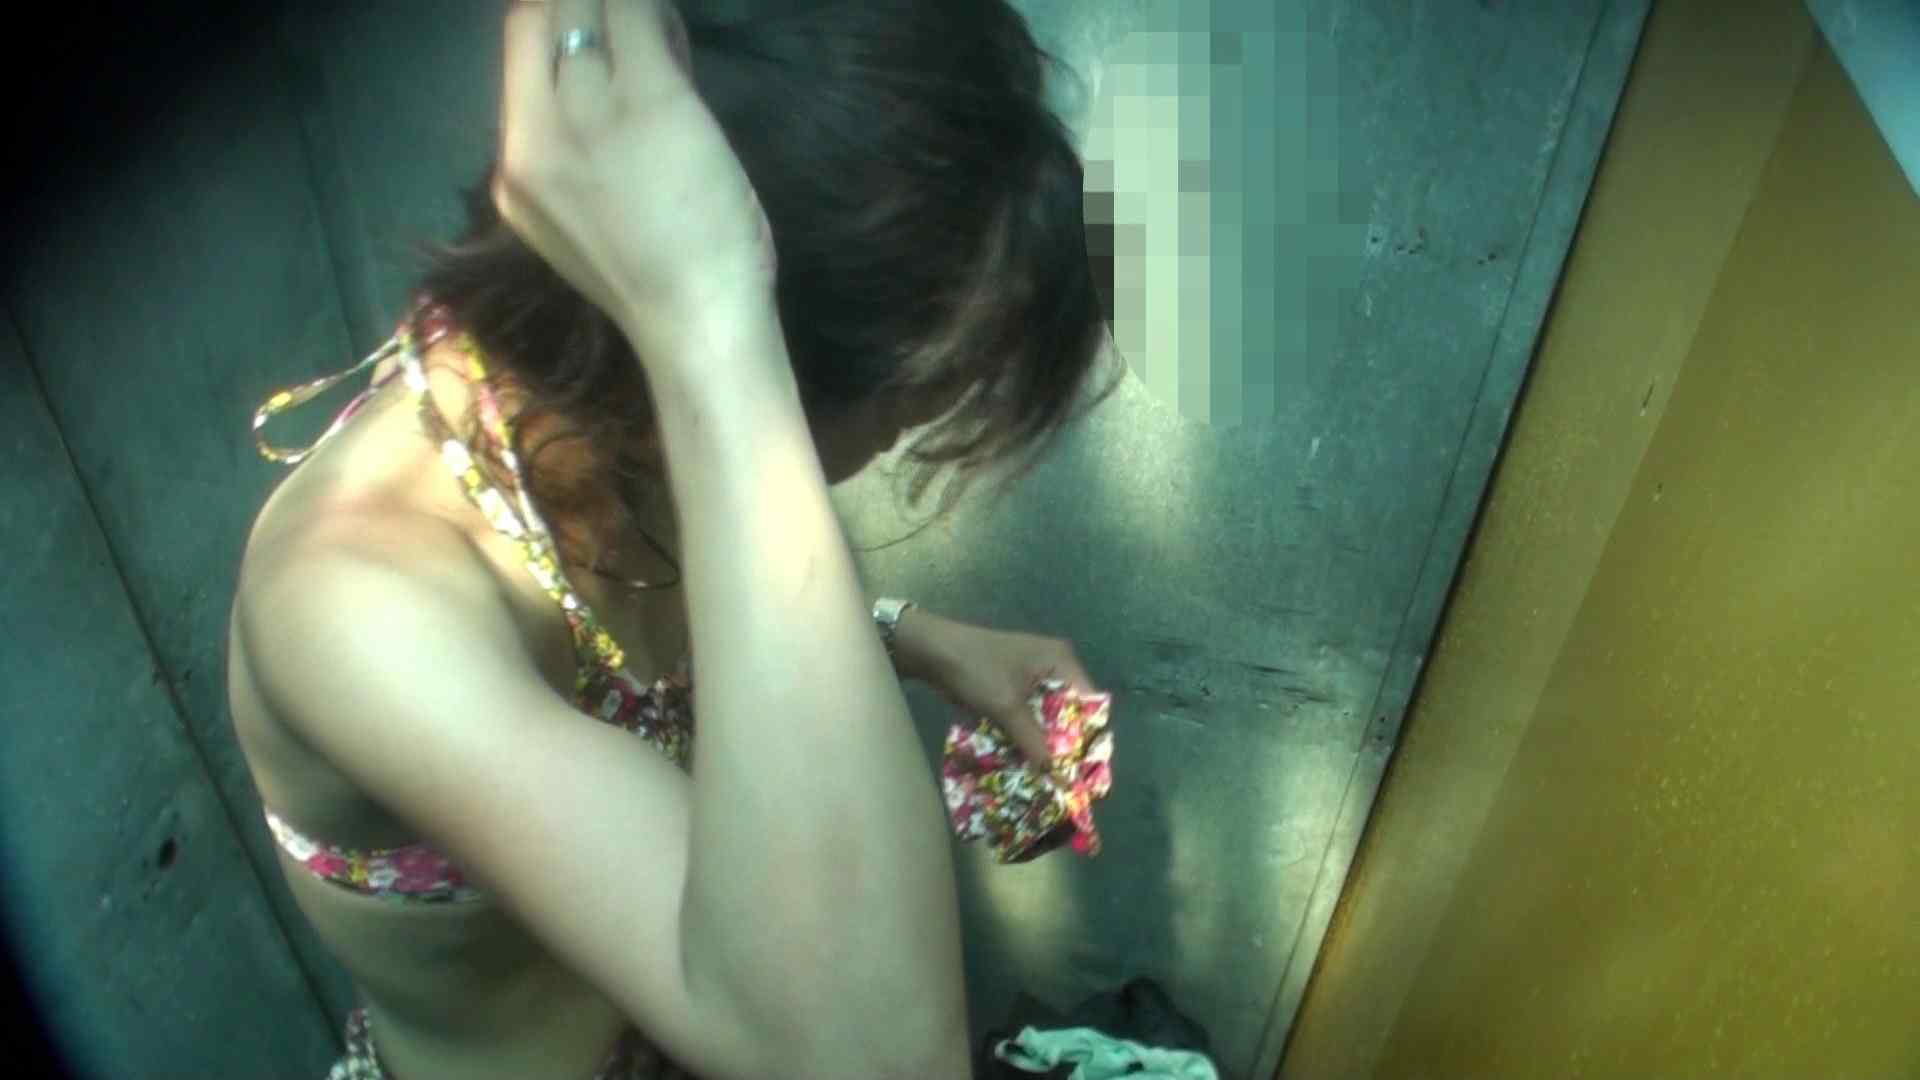 Vol.16 意外に乳首は年増のそれ 細身体型 AV無料動画キャプチャ 105枚 59